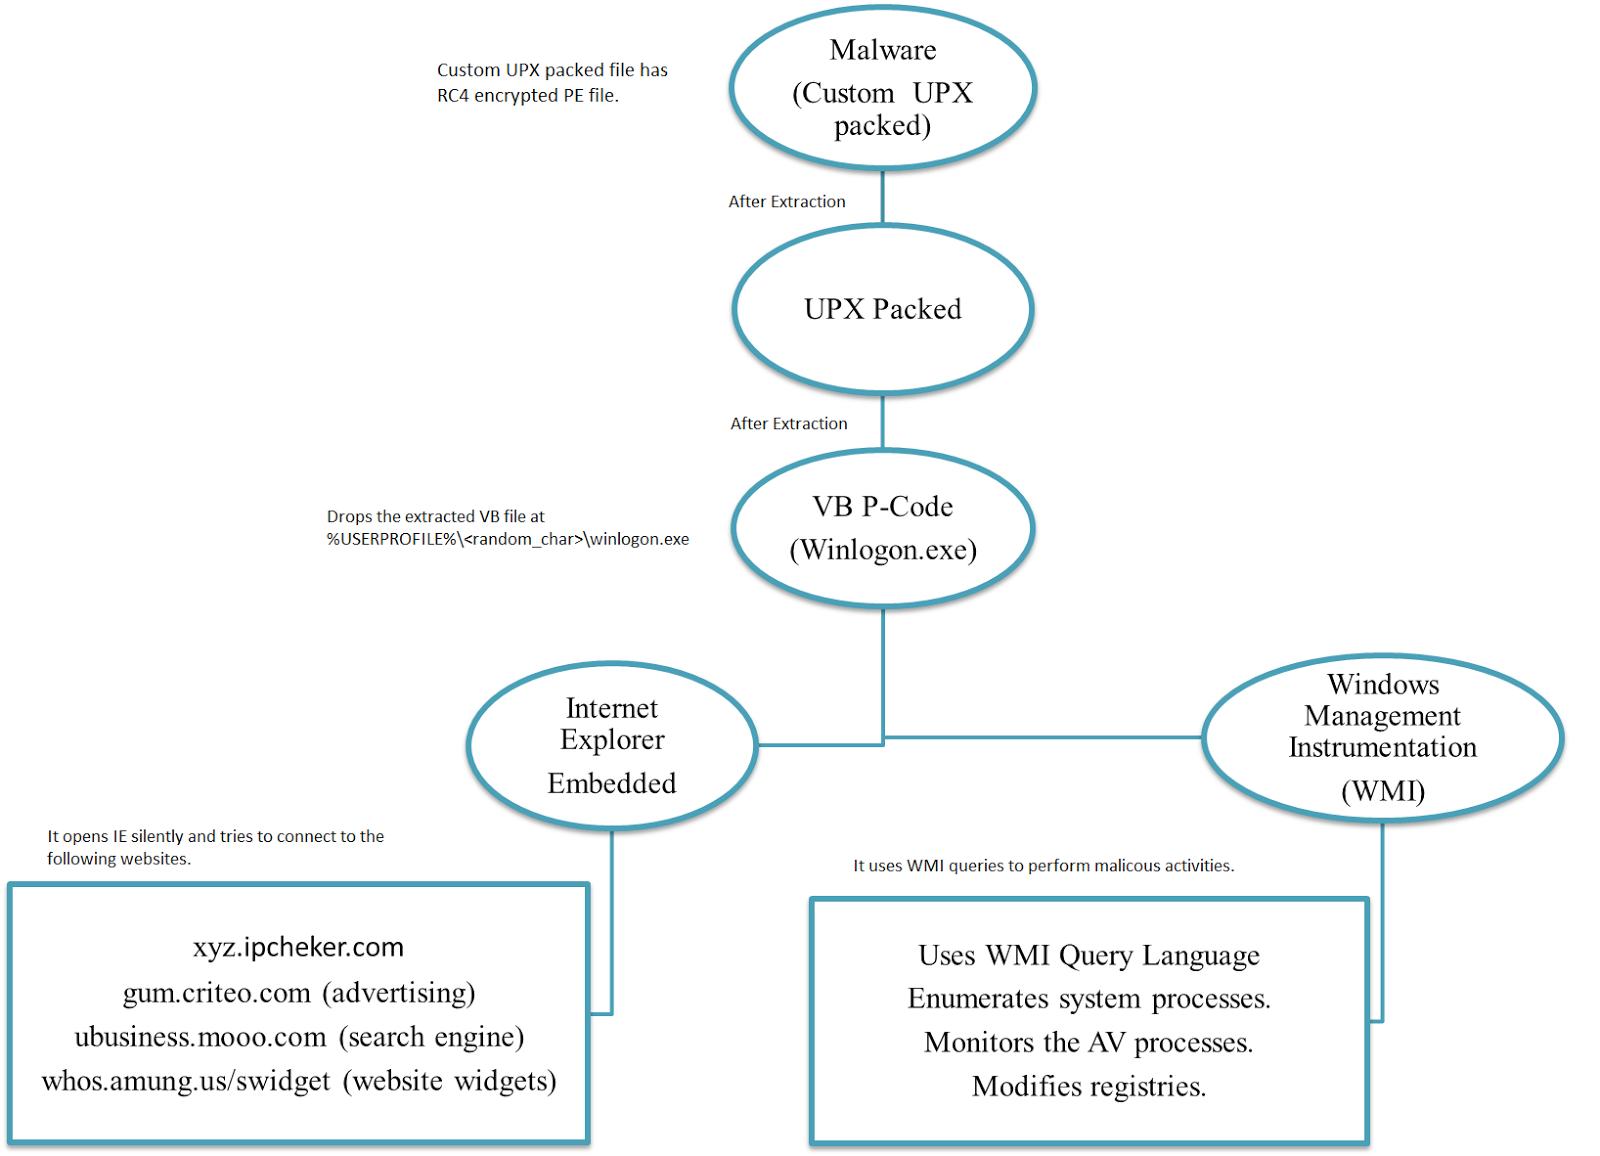 Analysis of malware using WMI Query Language ~ Malware